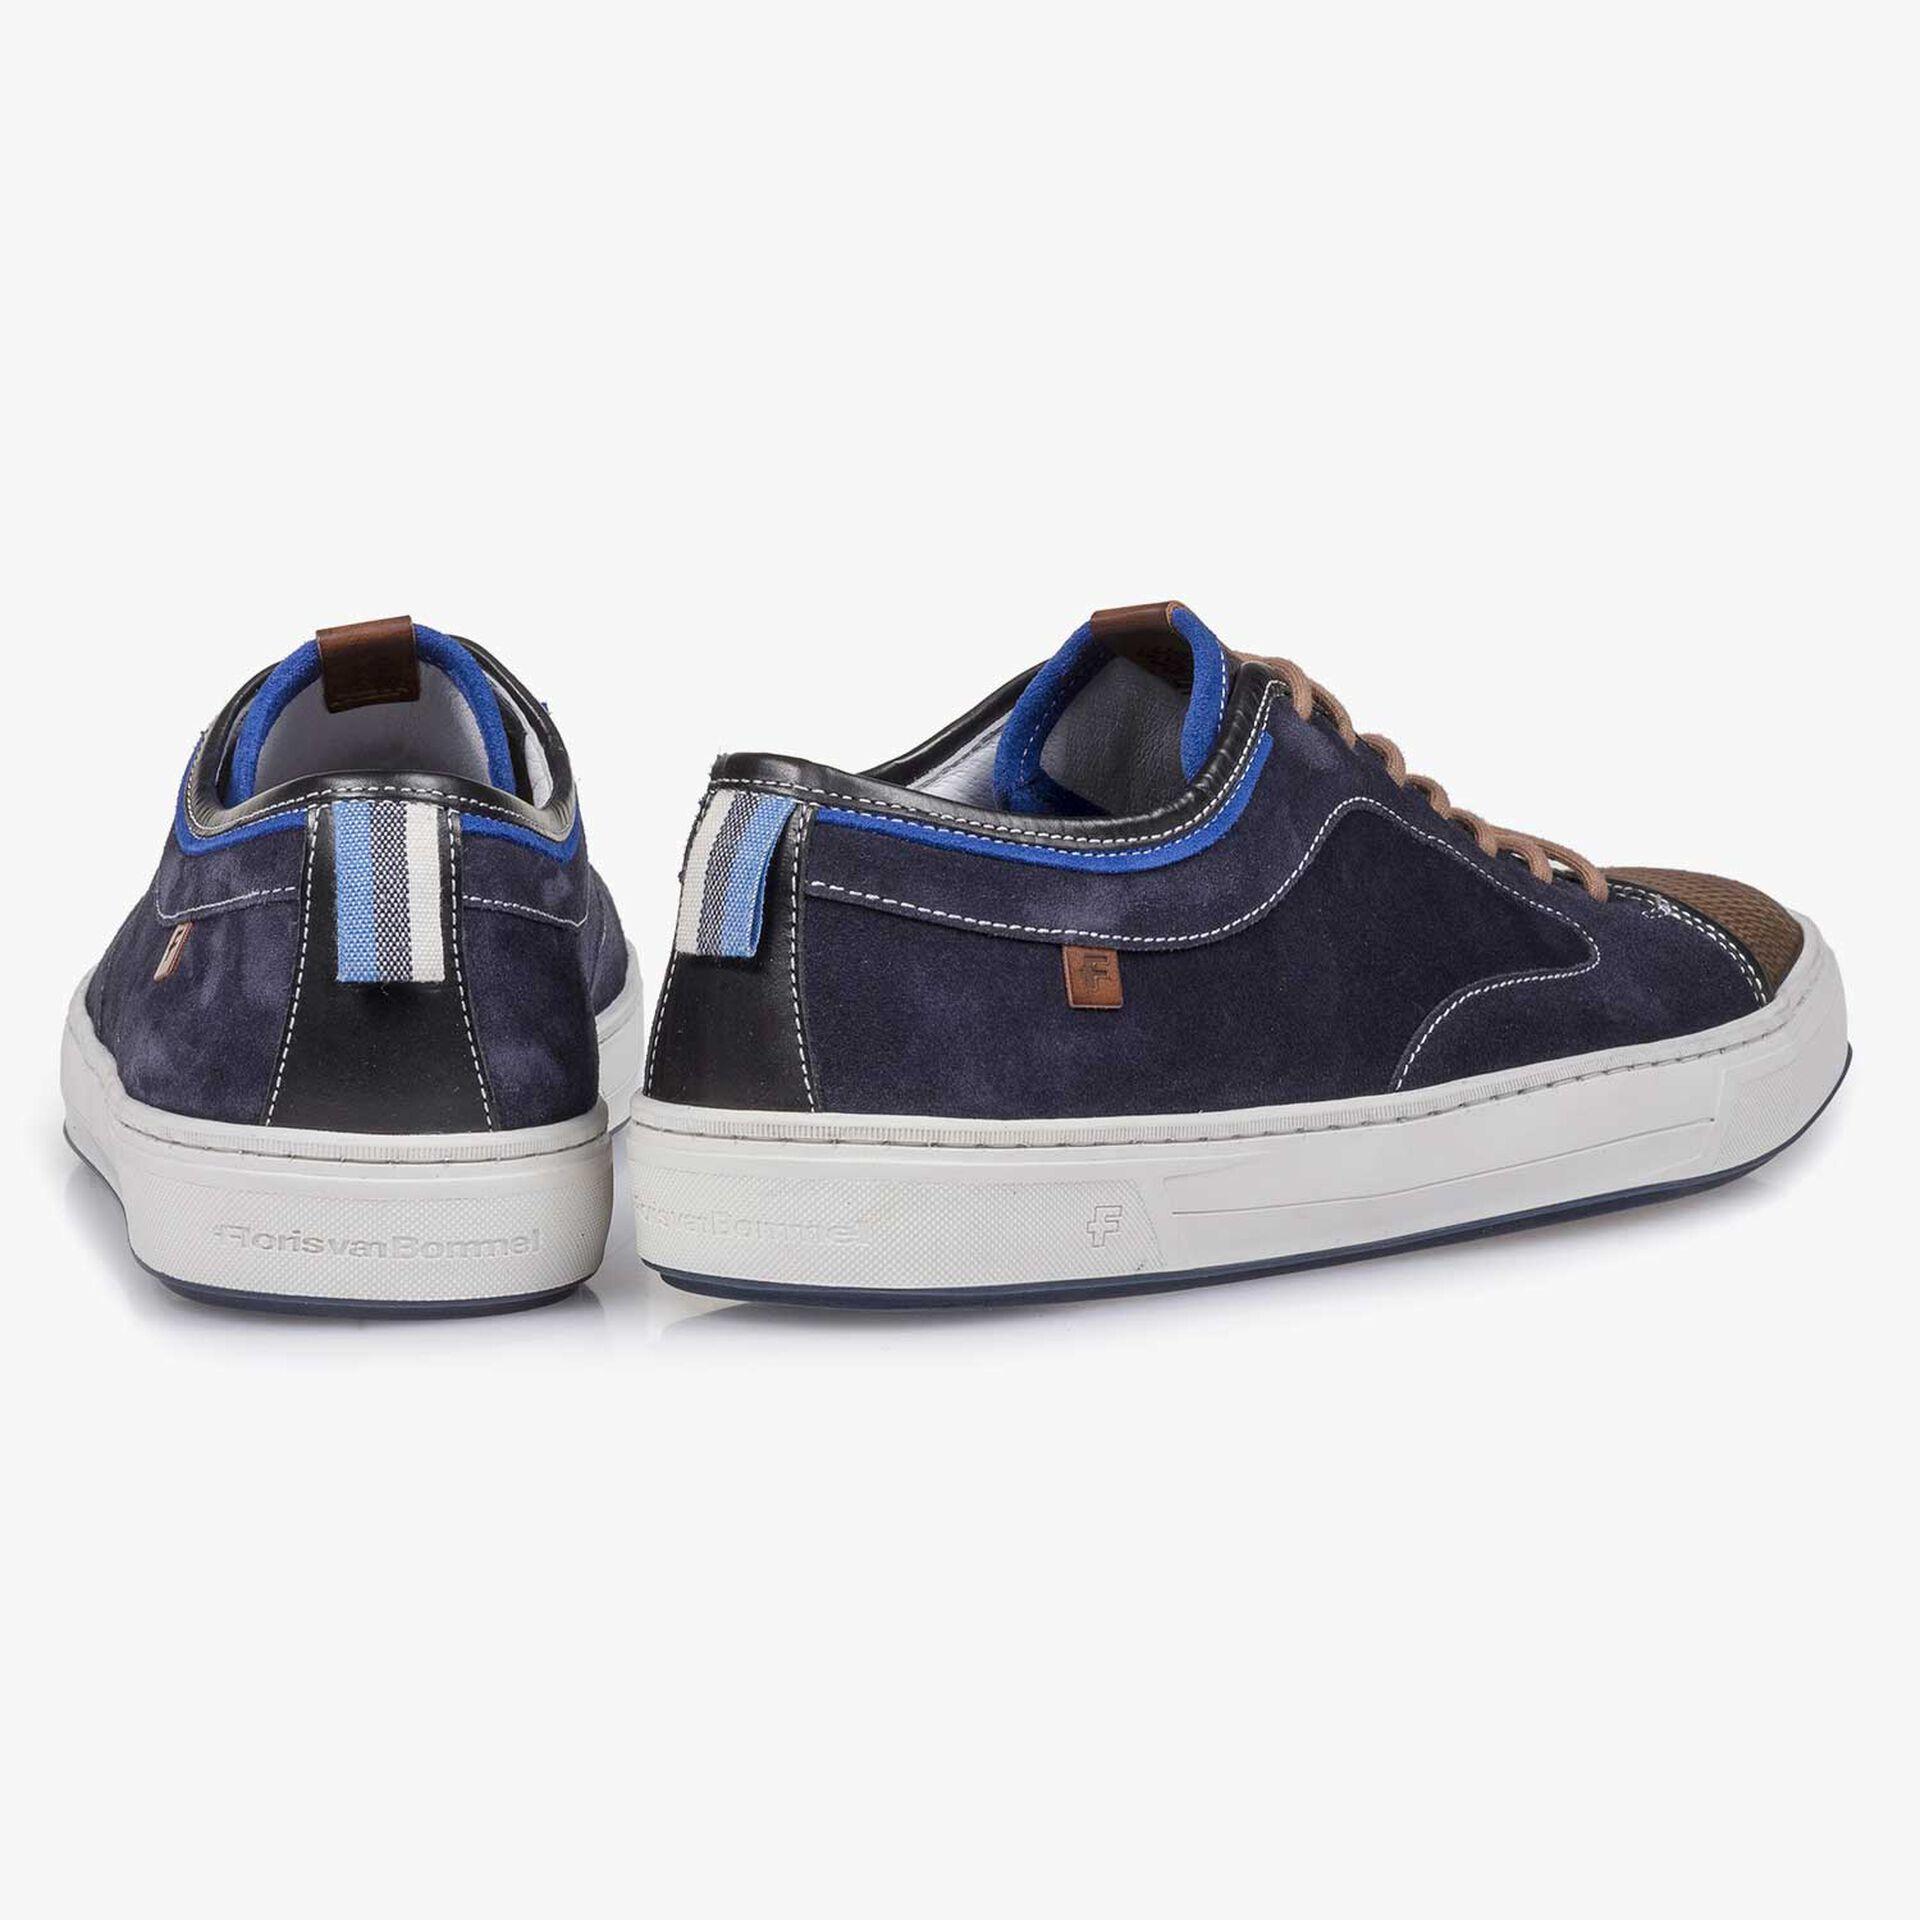 Dark grey & blue lizard print suede leather sneaker